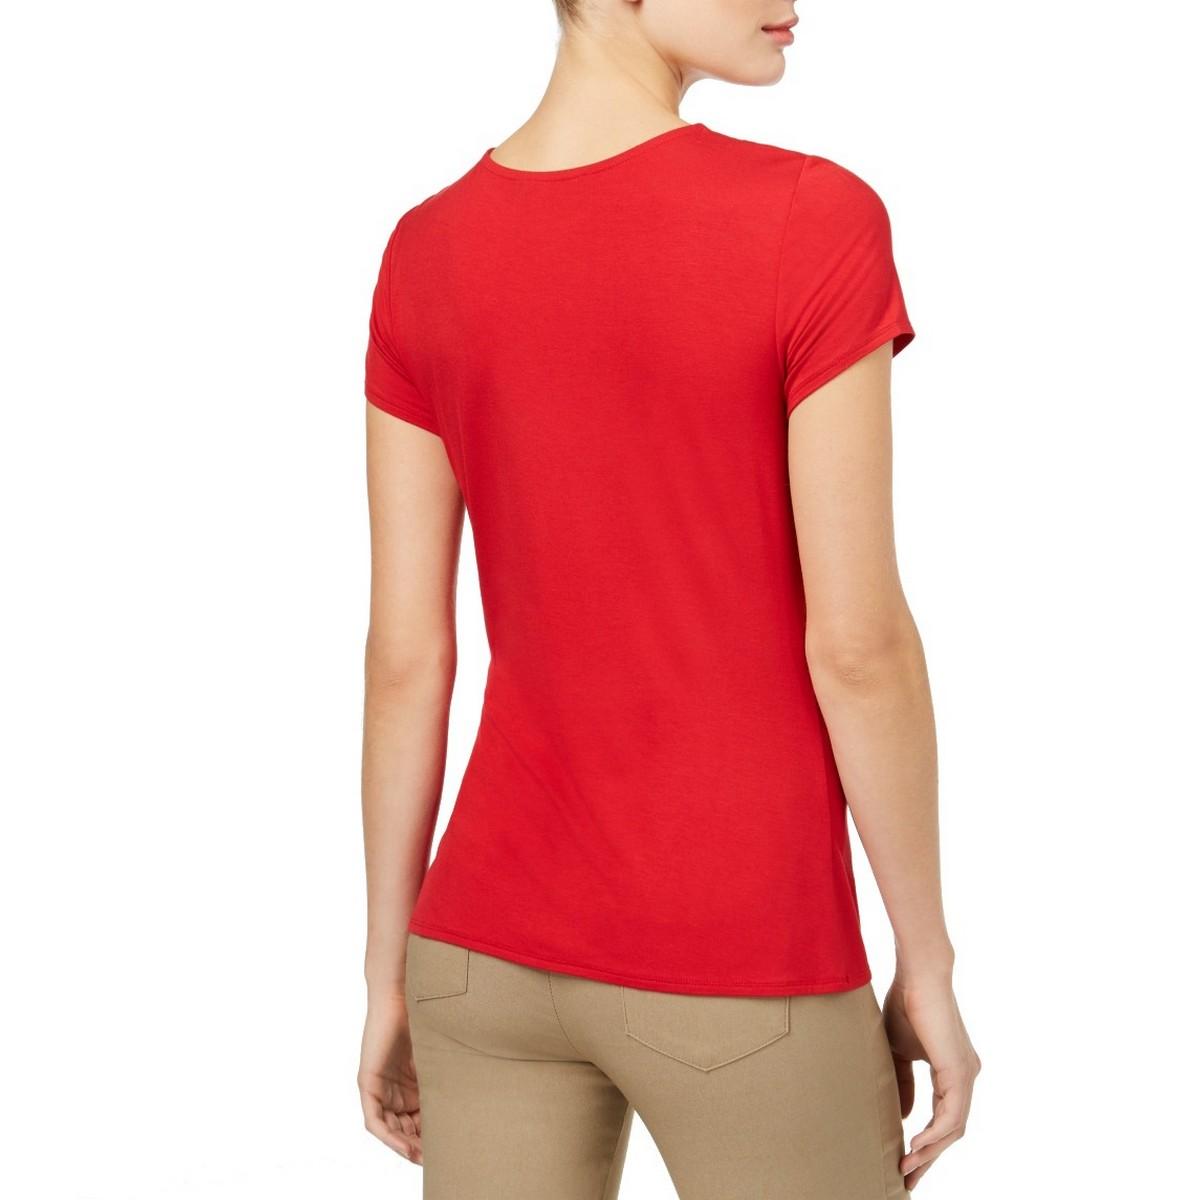 INC-NEW-Women-039-s-Short-Sleeve-Twist-front-Cutout-Casual-Shirt-Top-TEDO thumbnail 4